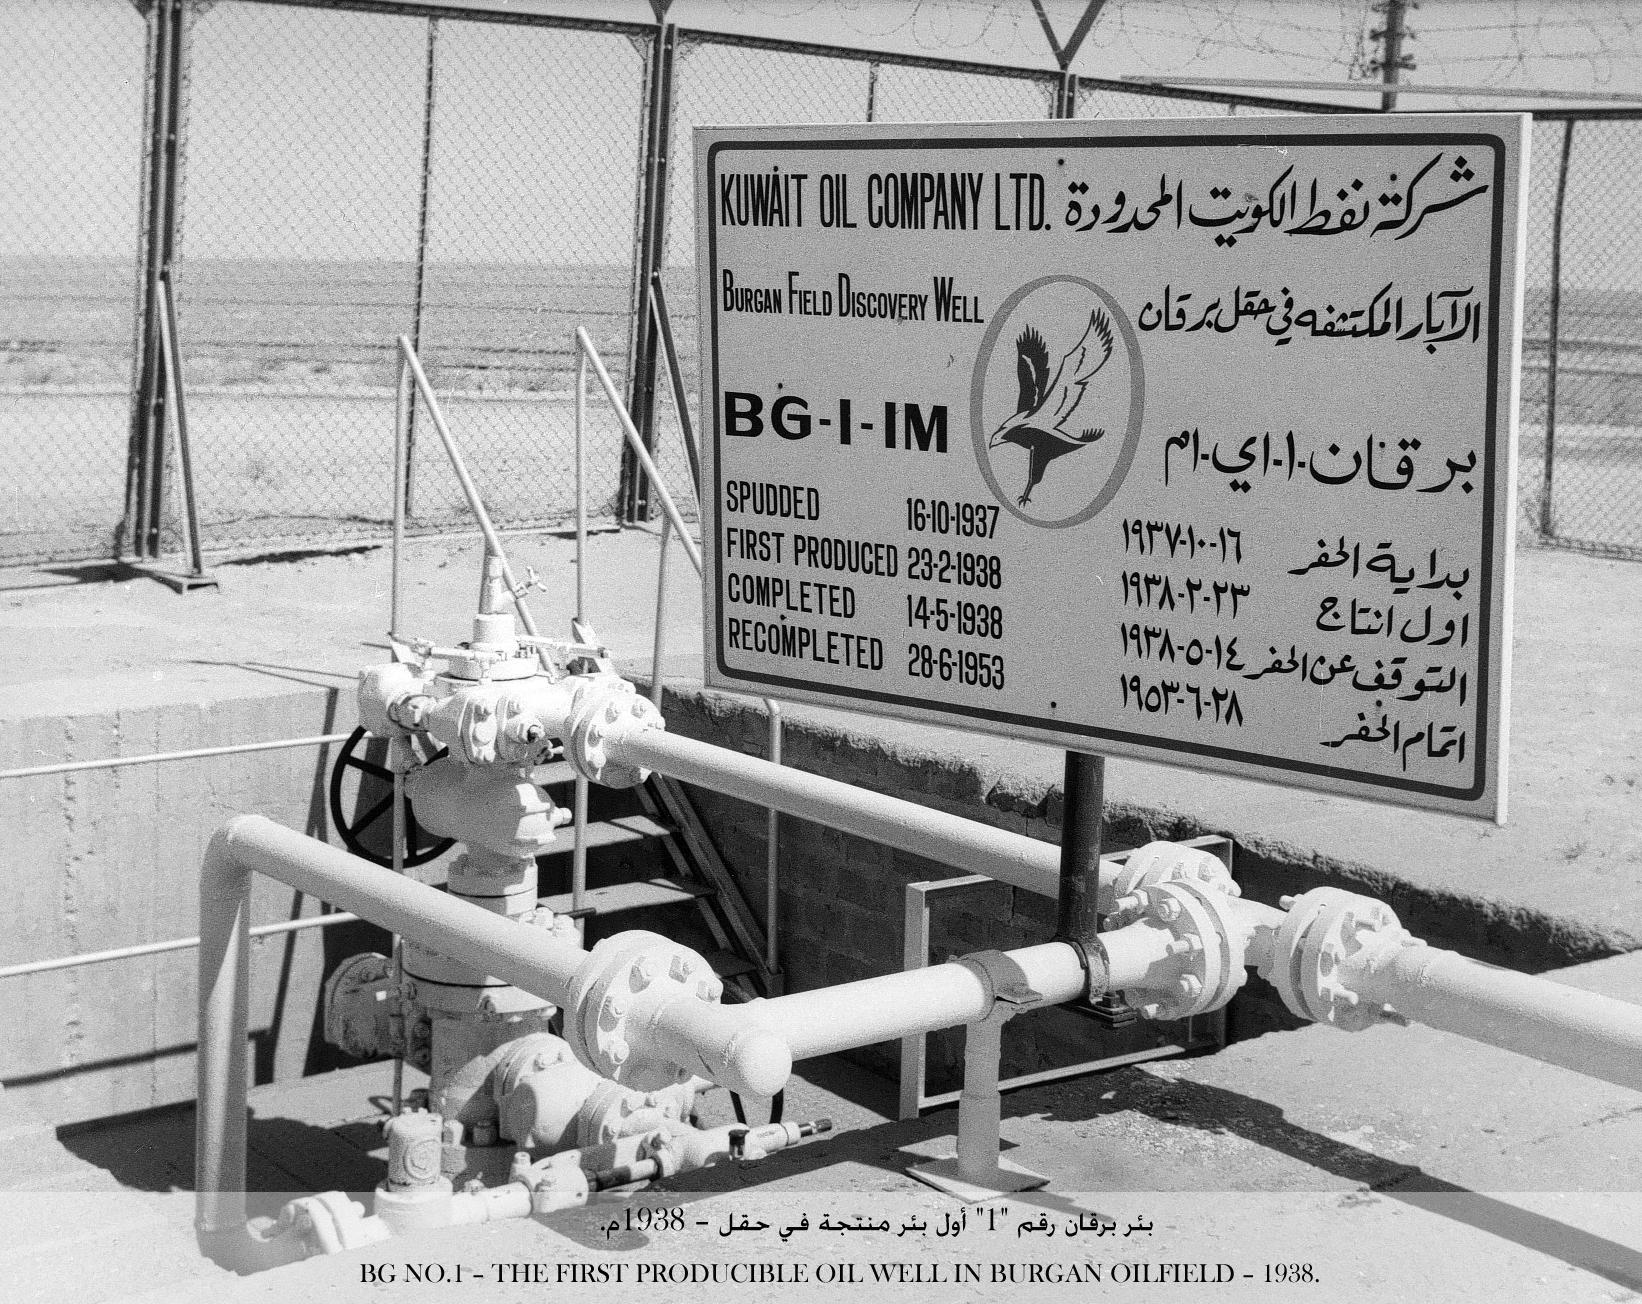 23-2-1938 First Oil Well at Burgan.jpg